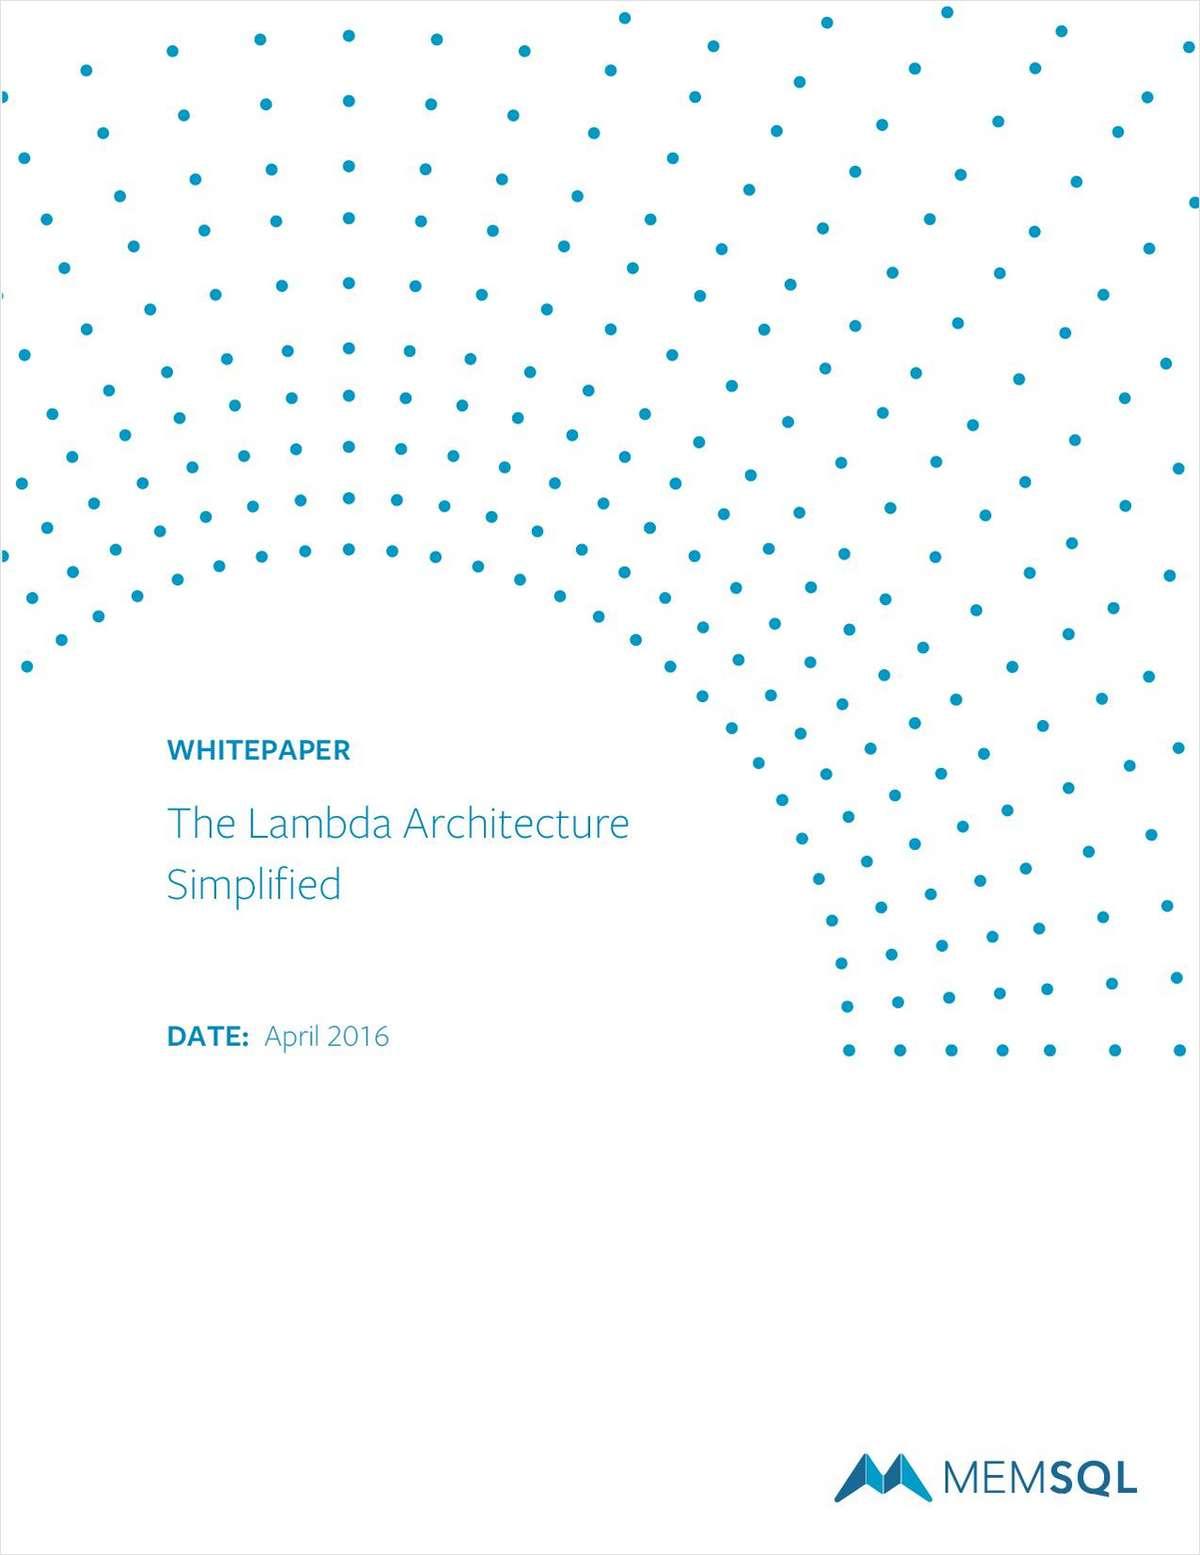 The Lambda Architecture Simplified